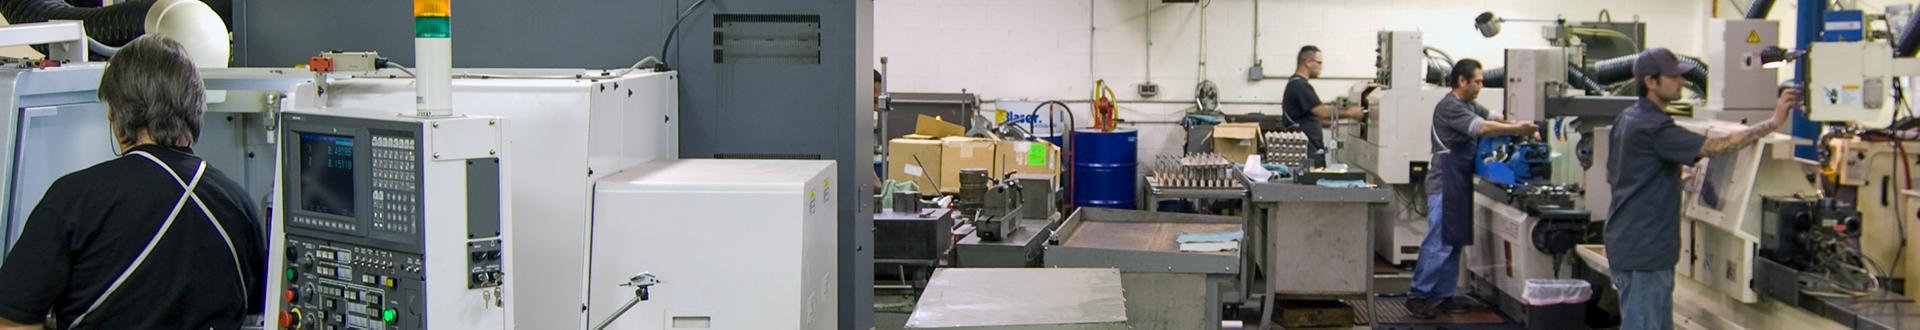 cowan precision grinding shop floor